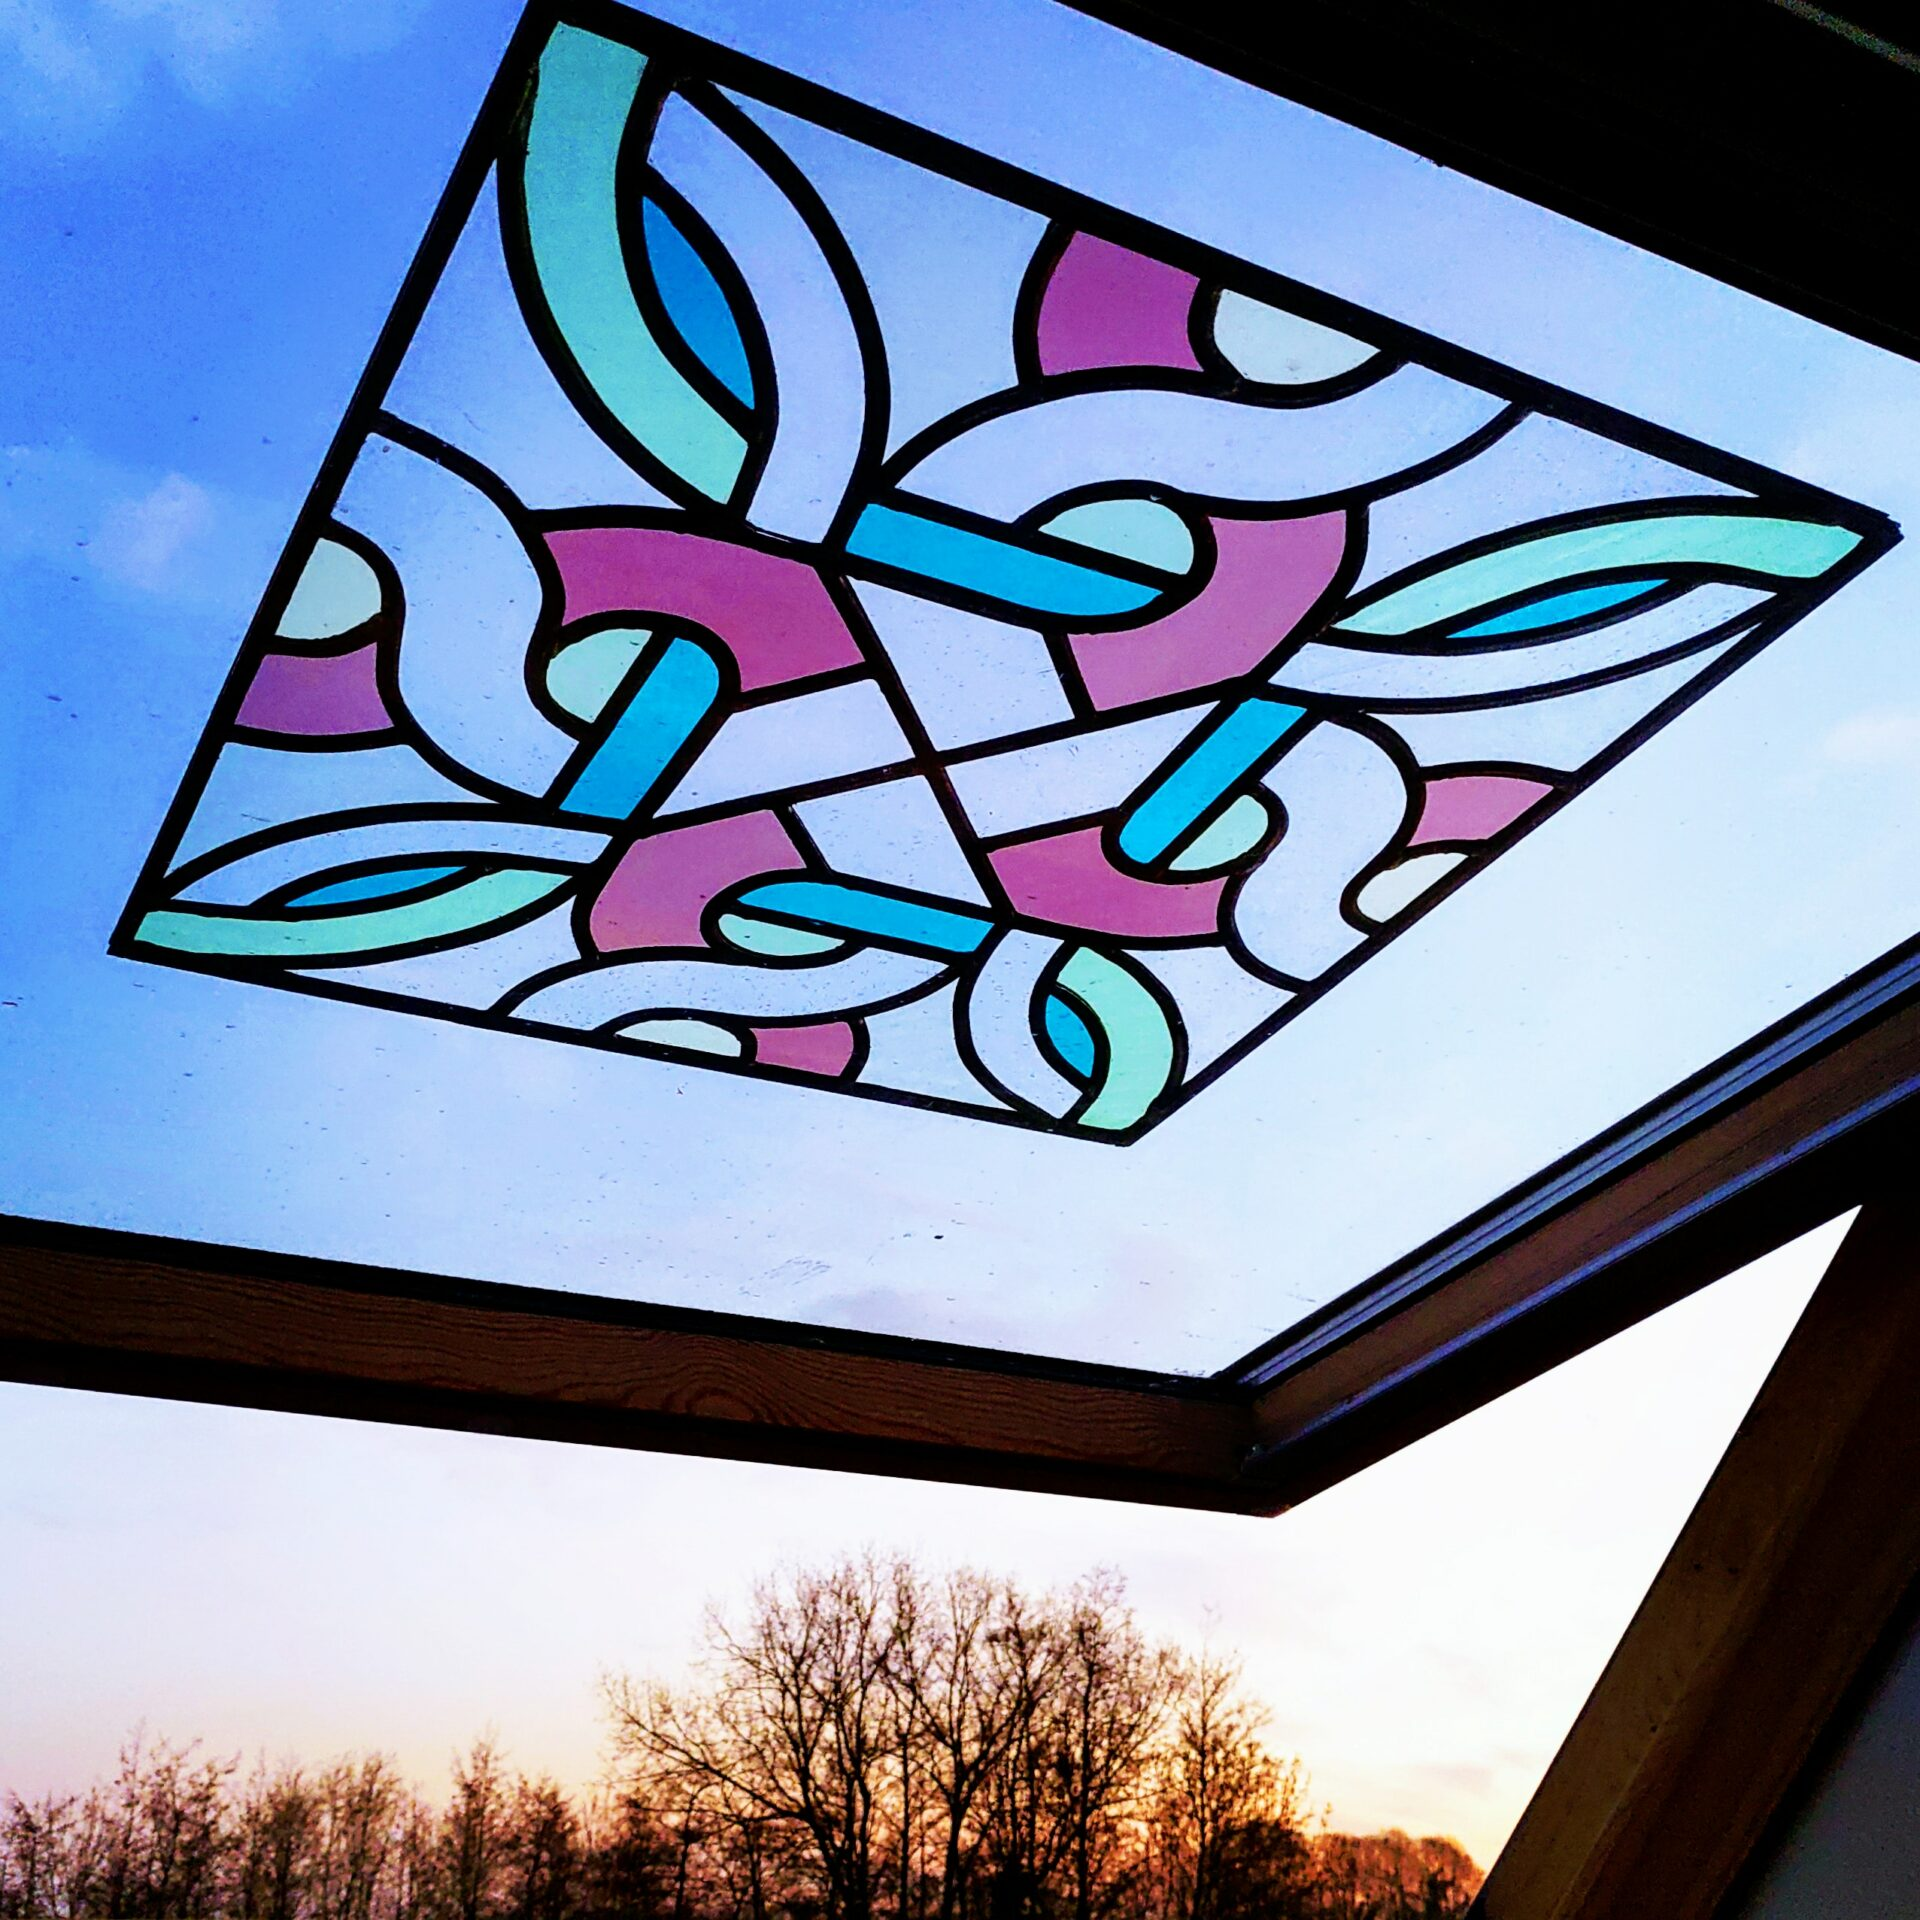 Glasraam glas-in-lood vitrail stained glas Isabelle Decallonne Atelier Illumen raamdecoratie handgemaakt ambachtelijk